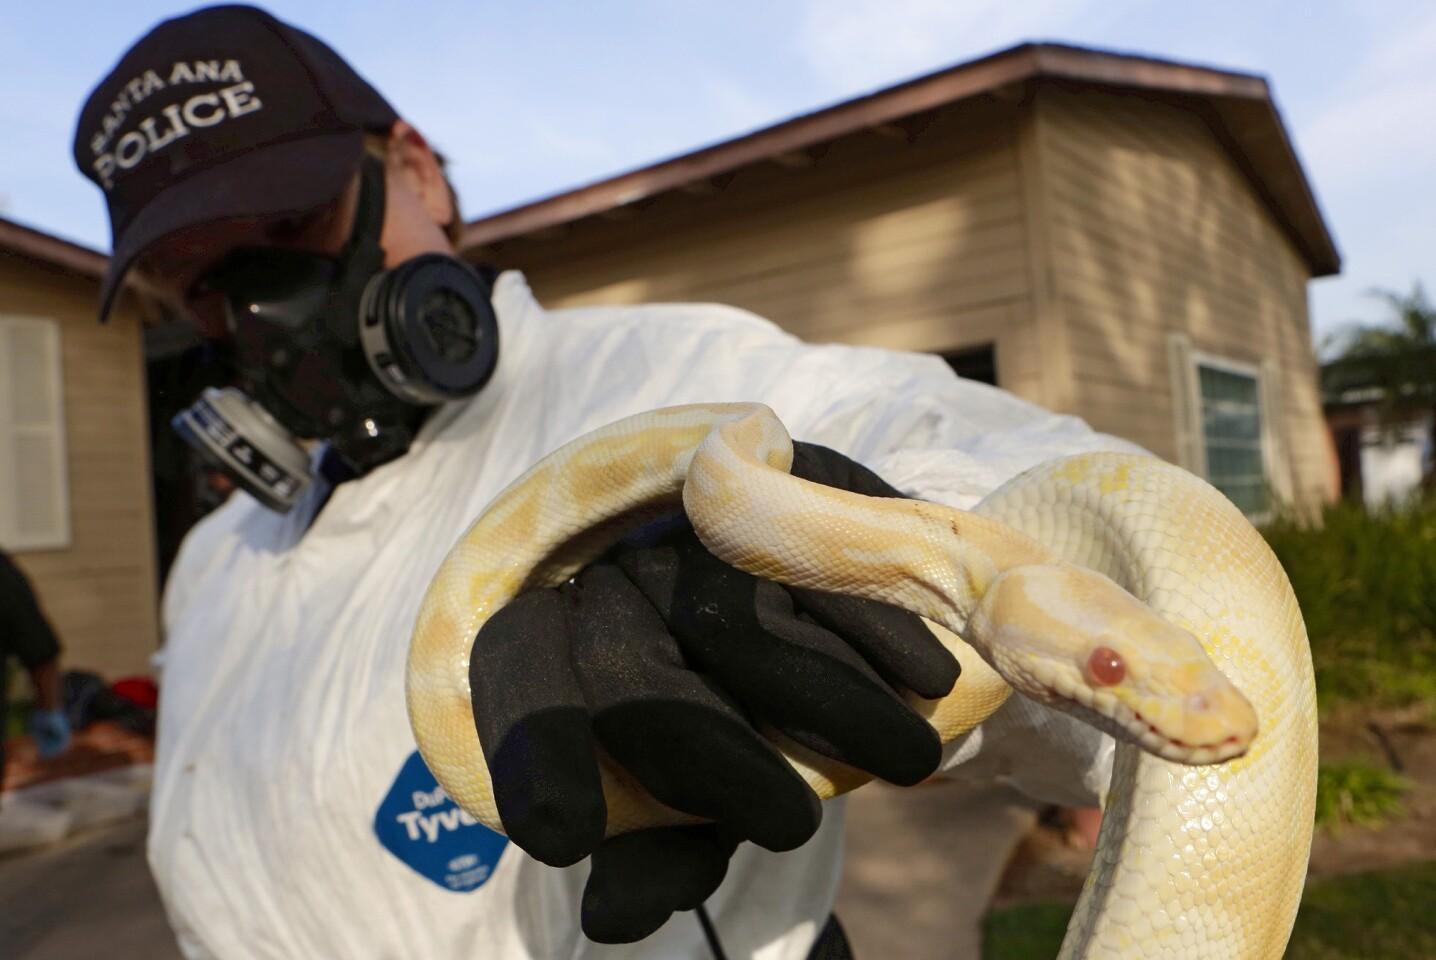 Santa Ana Police Animal Services supervisor Sondra Berg holds one of the living pythons found inside a Santa Ana home.